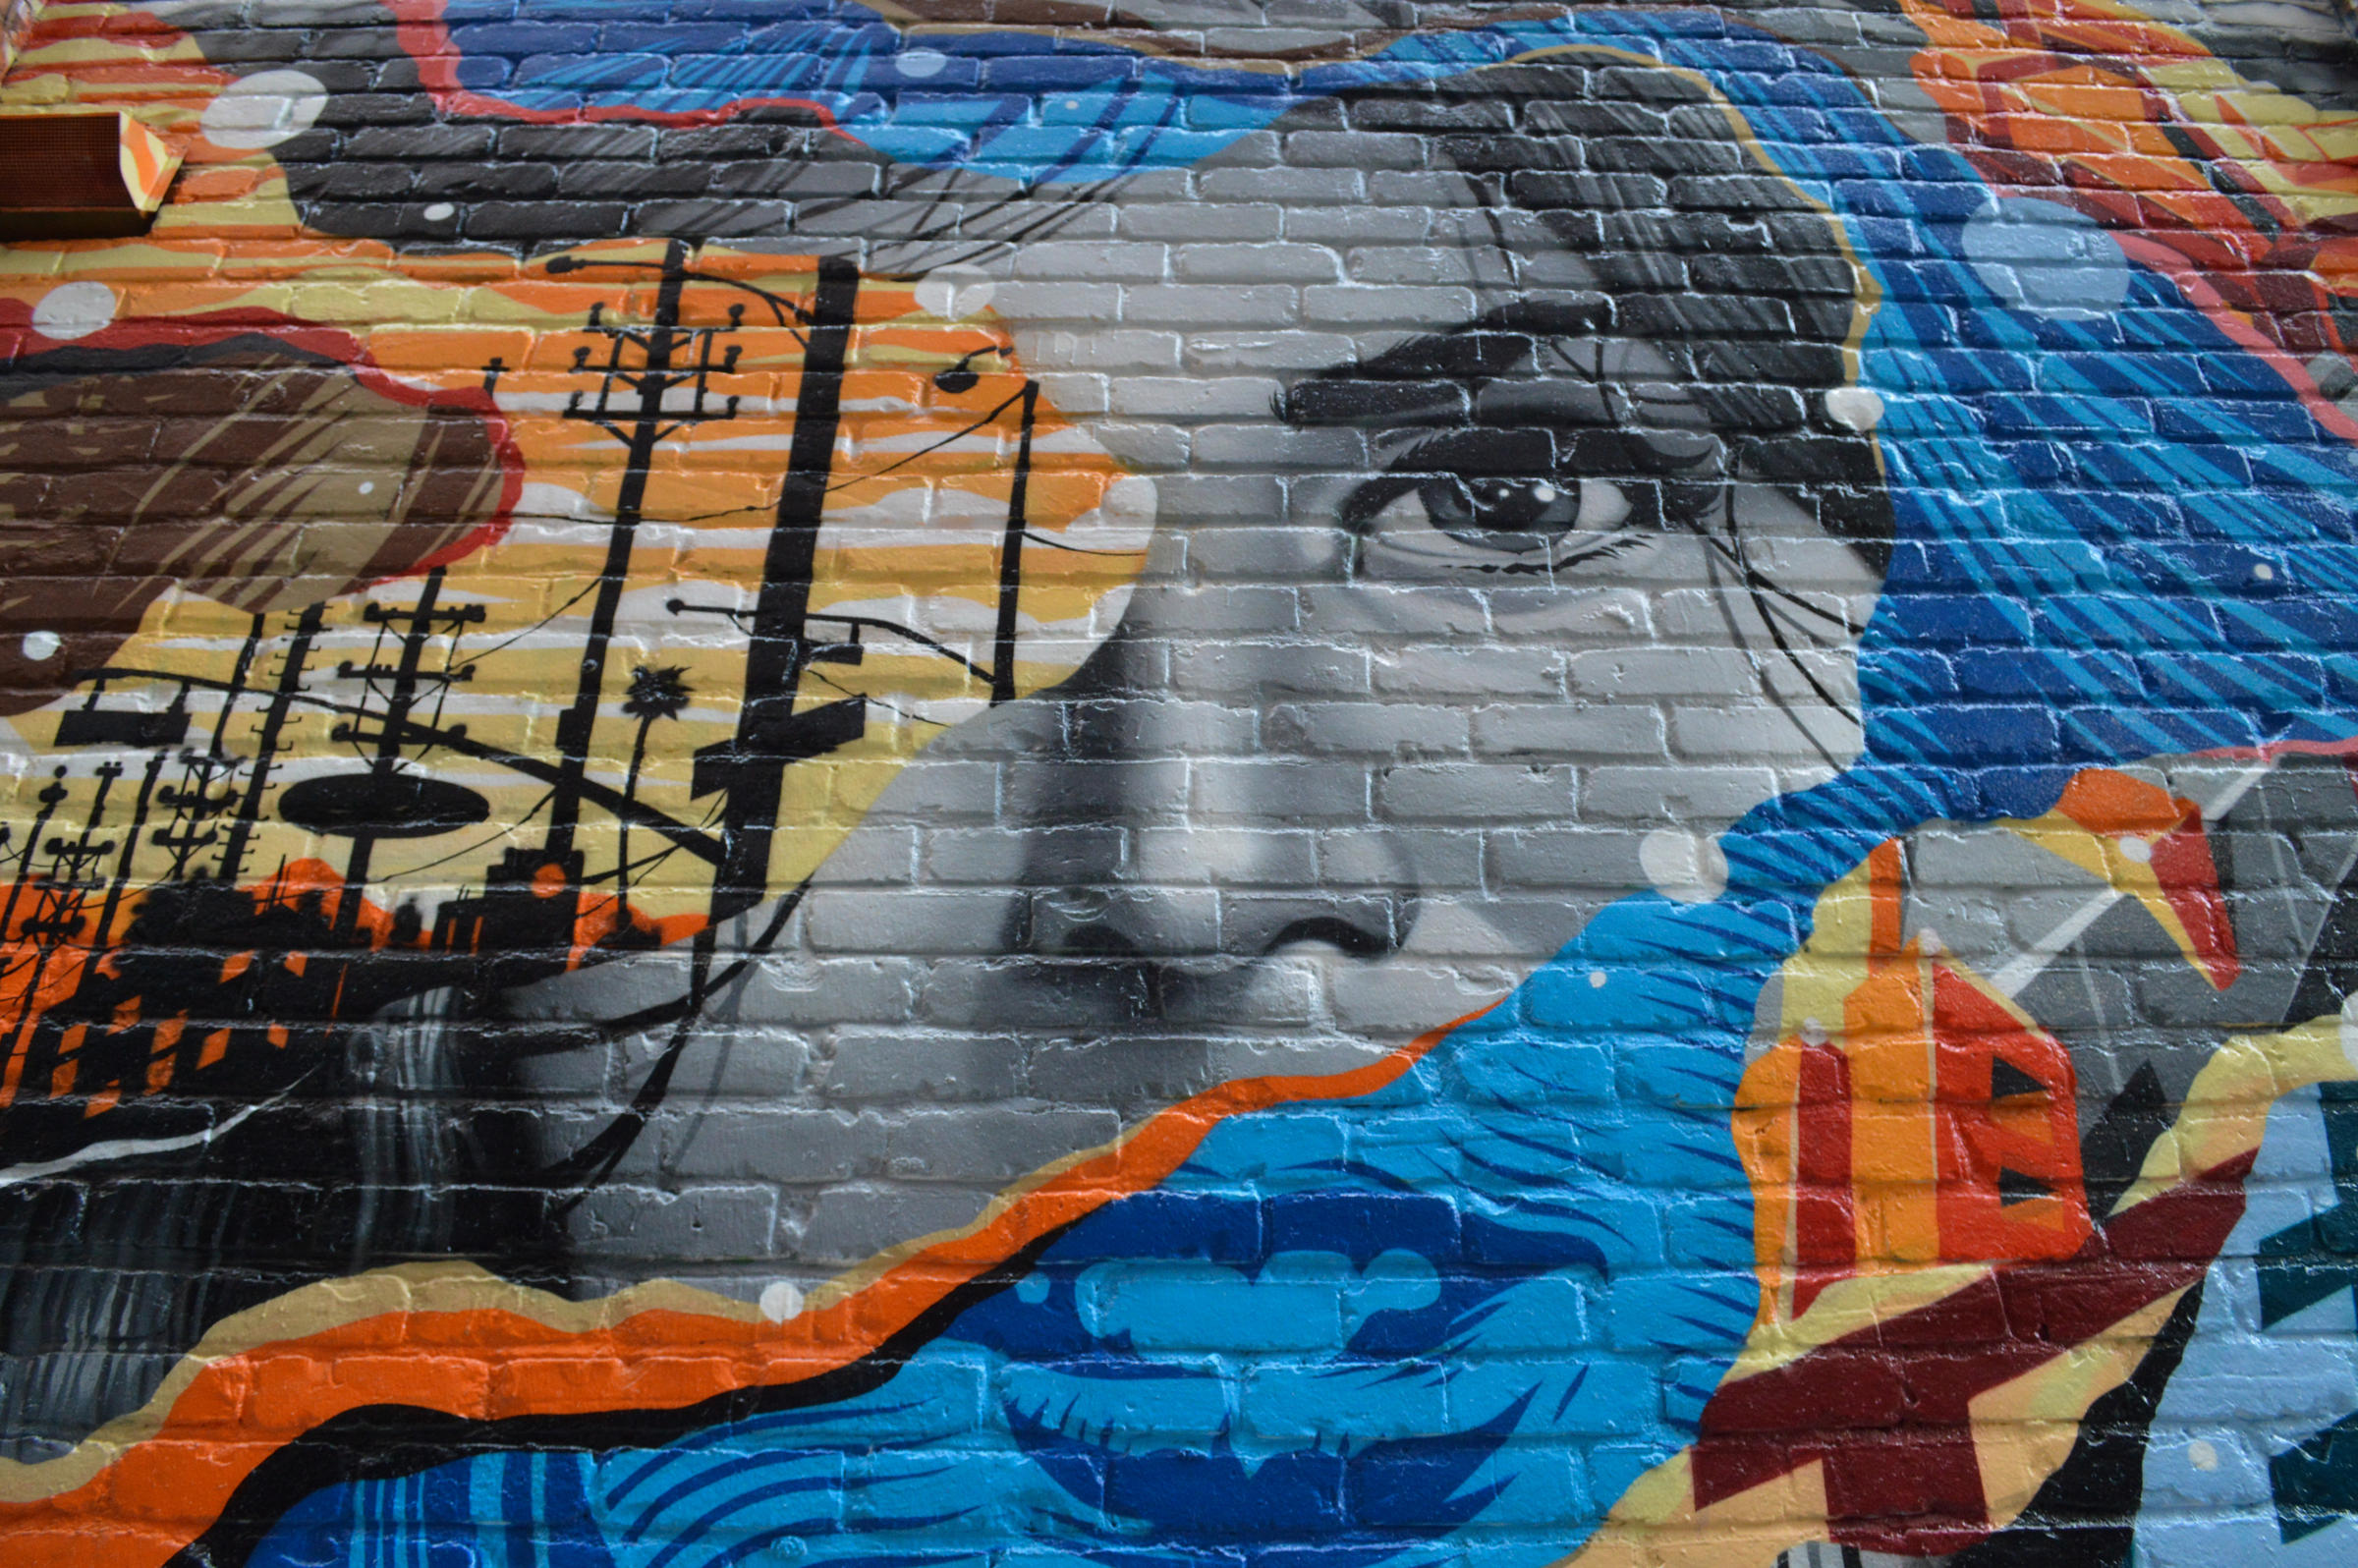 The Belt is Detroit's newest urban art installment ...